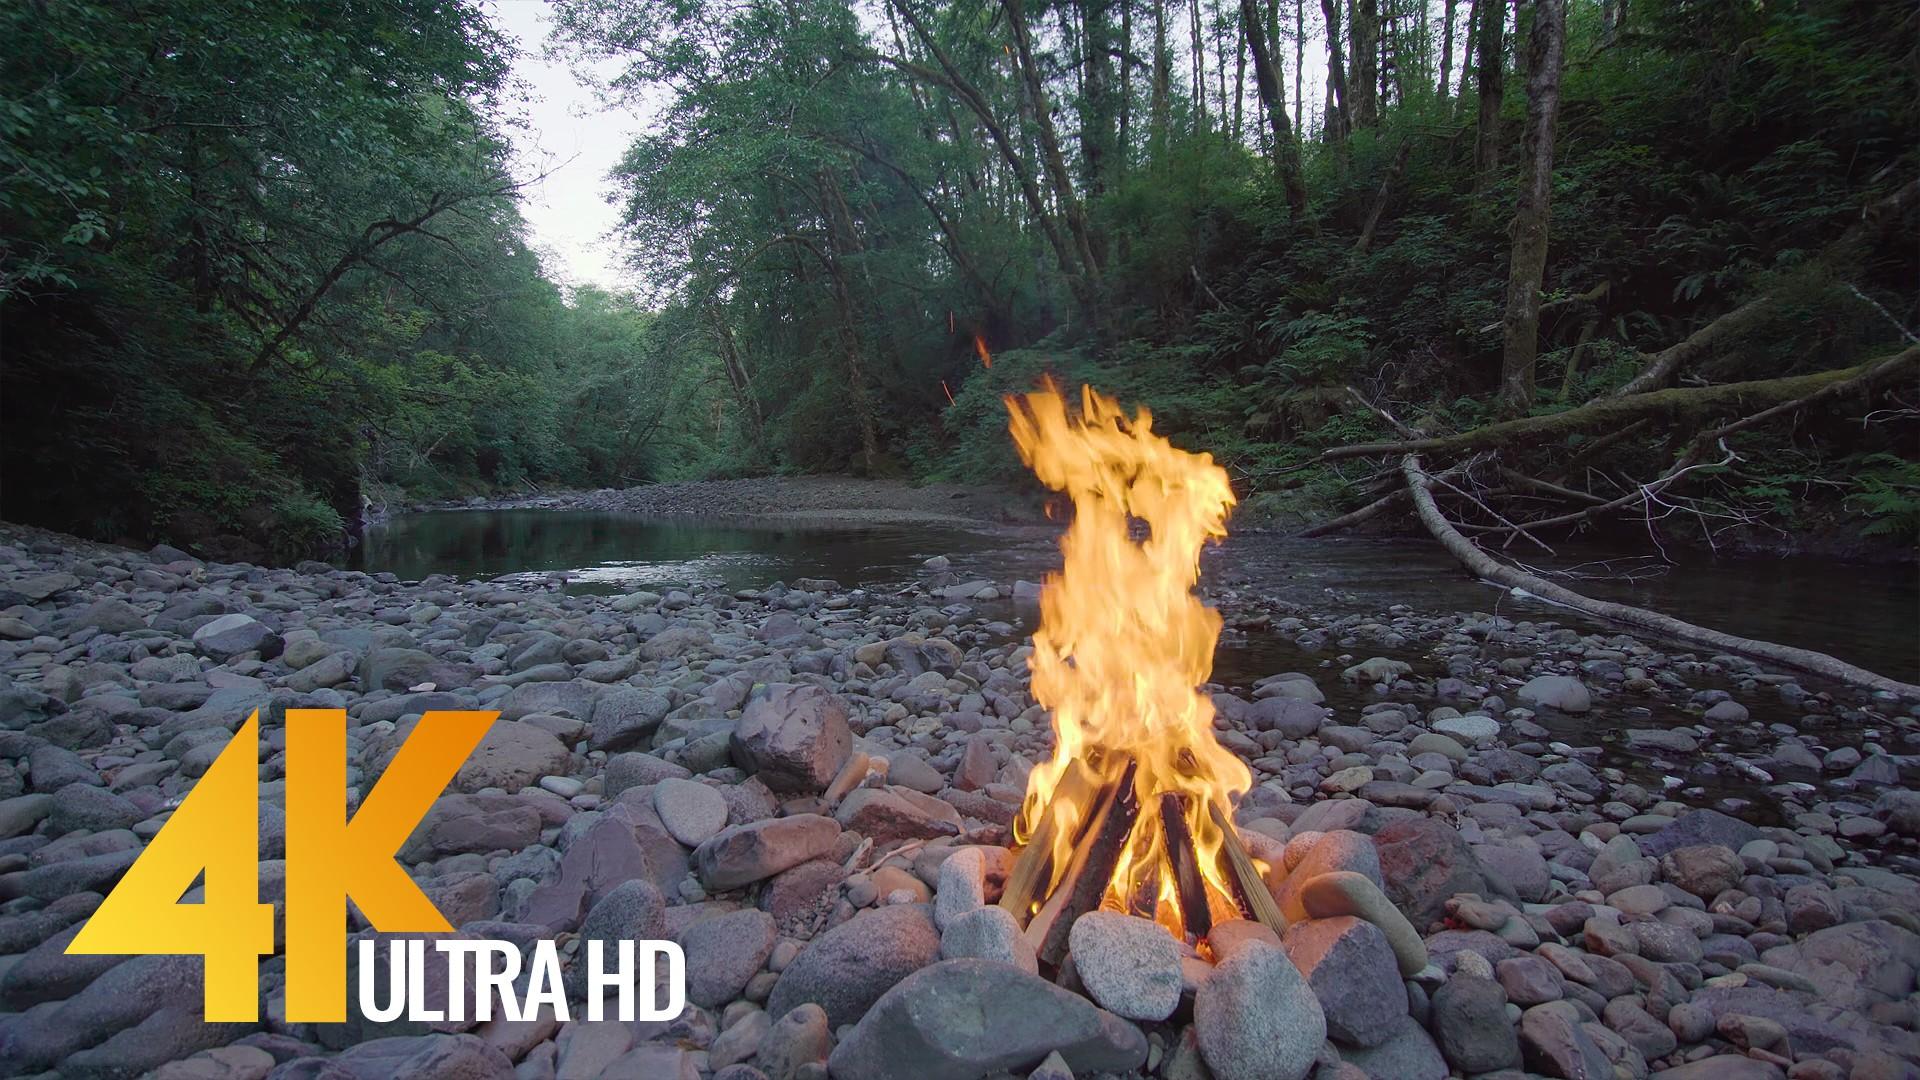 4K Relax Video Campfire Near The River Episode 1 3 HRS